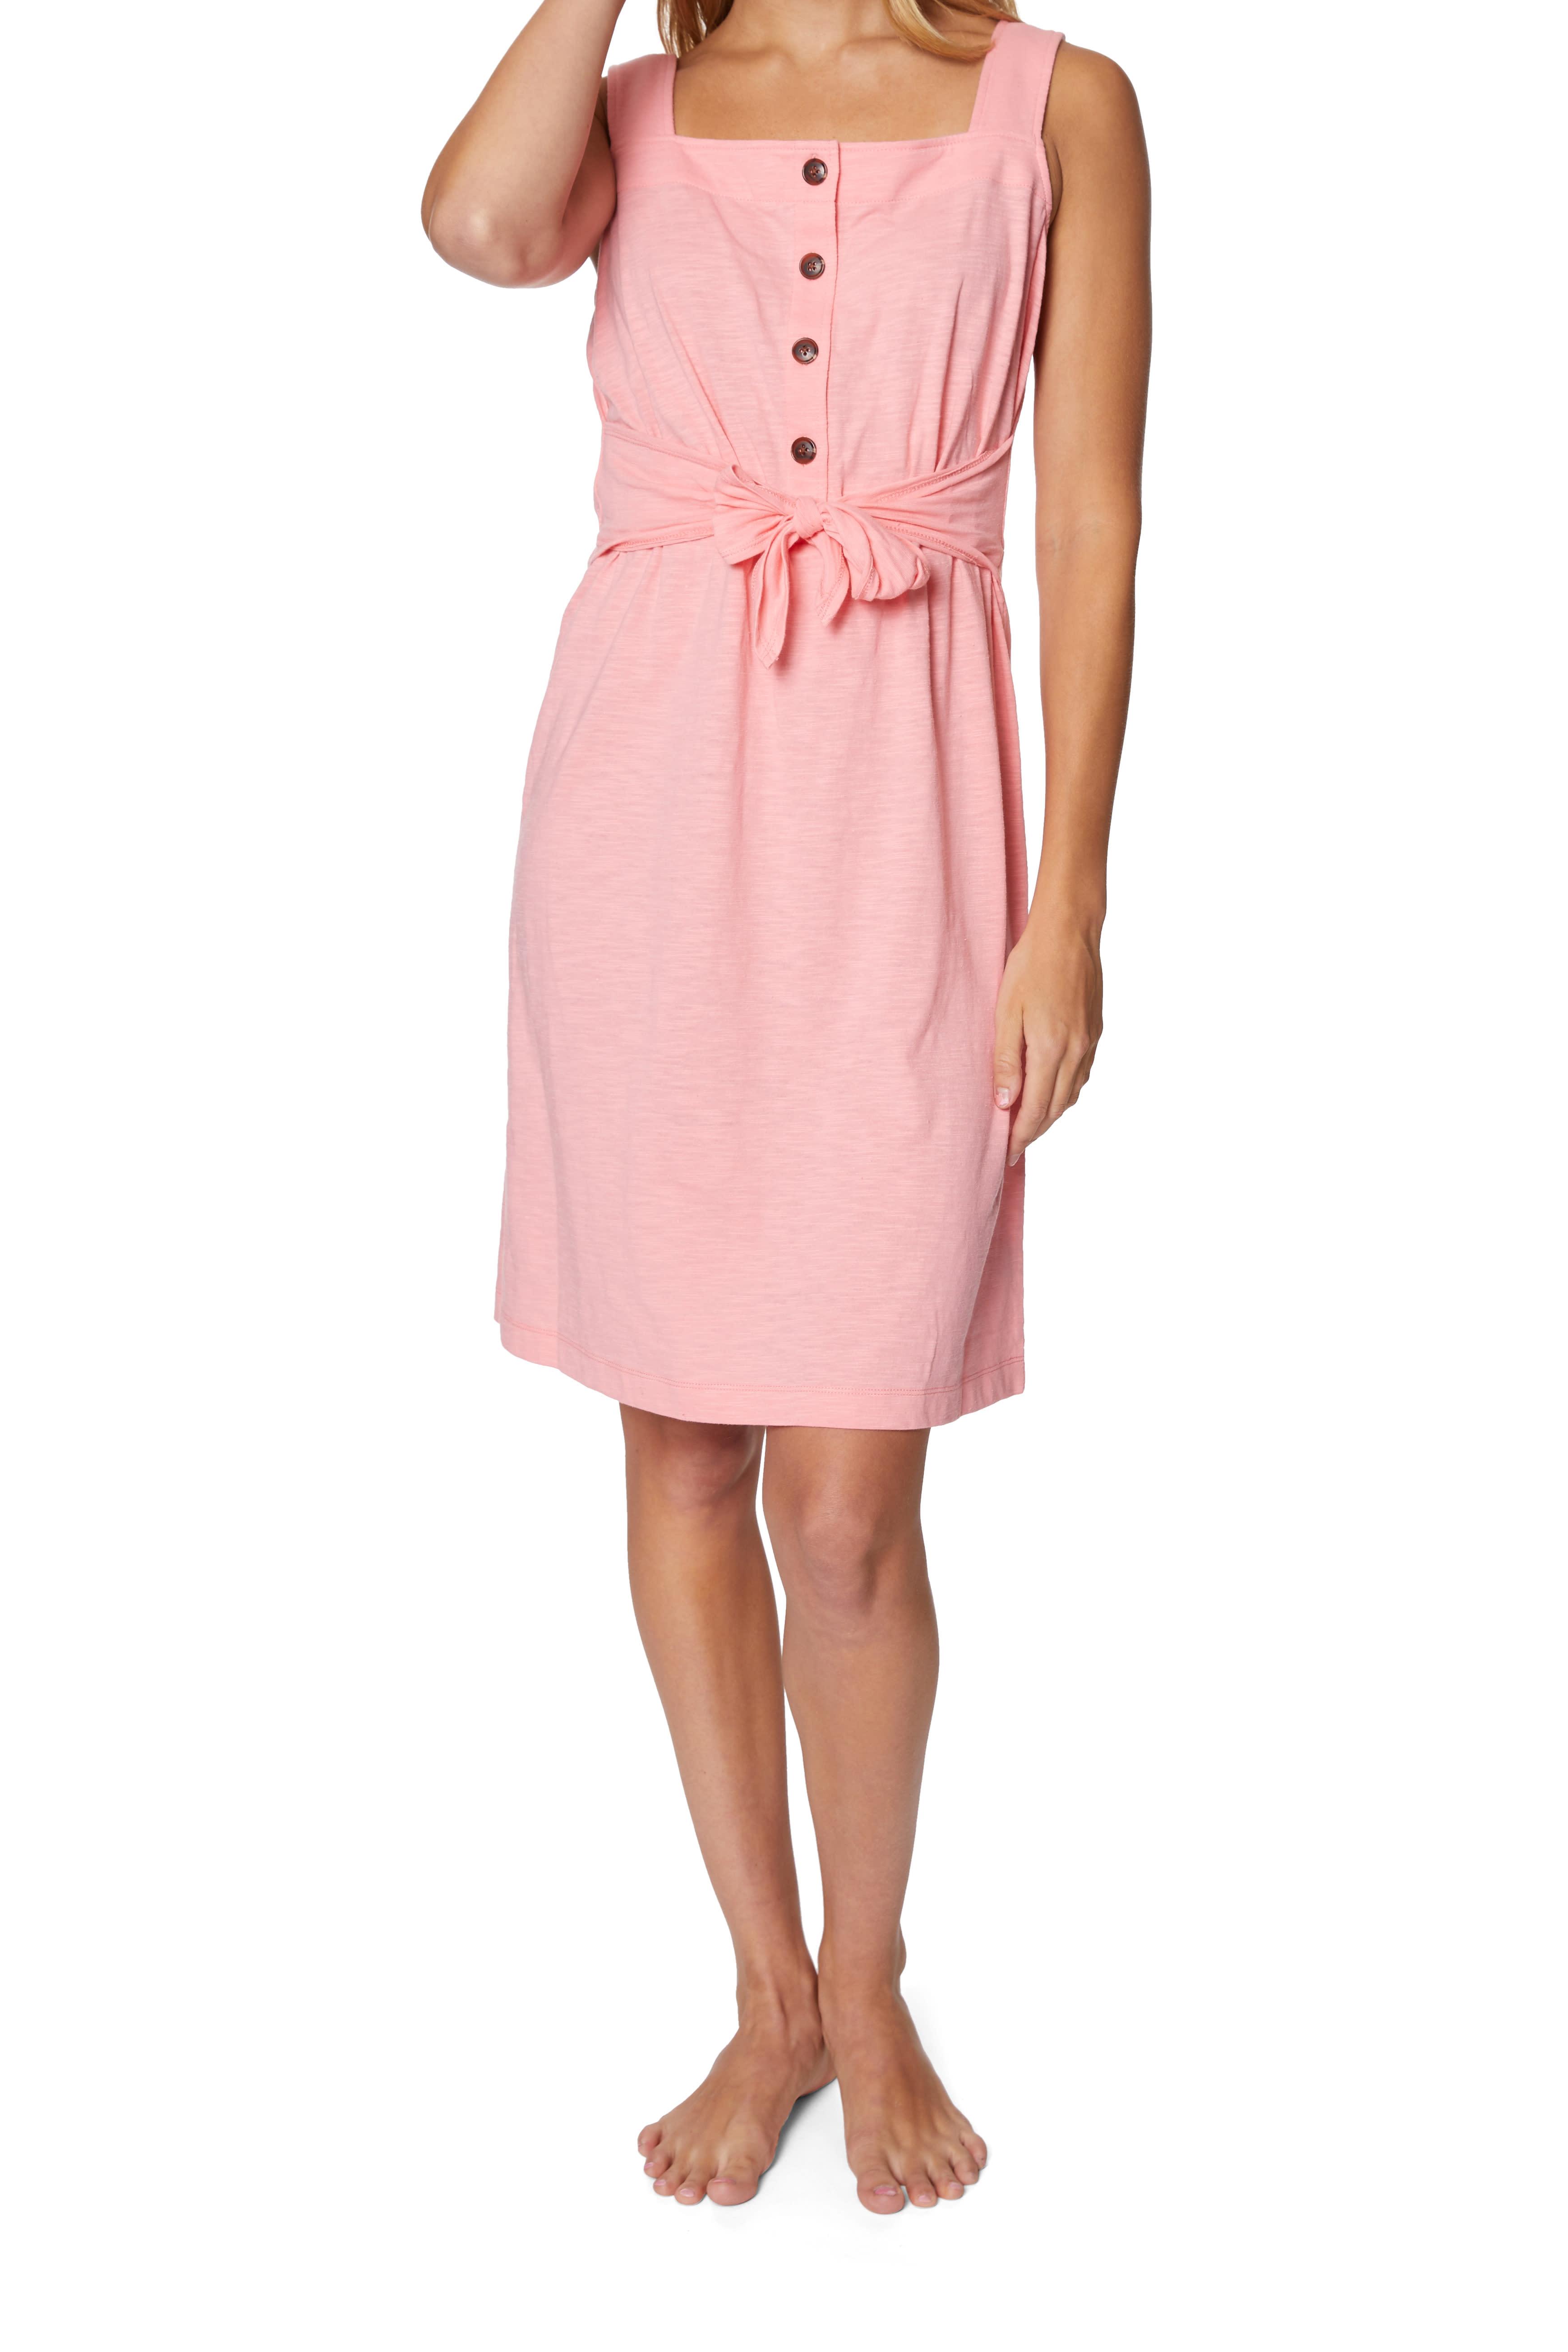 Caribbean Joe® Front Knot Button-Up Dress - Pink - Front